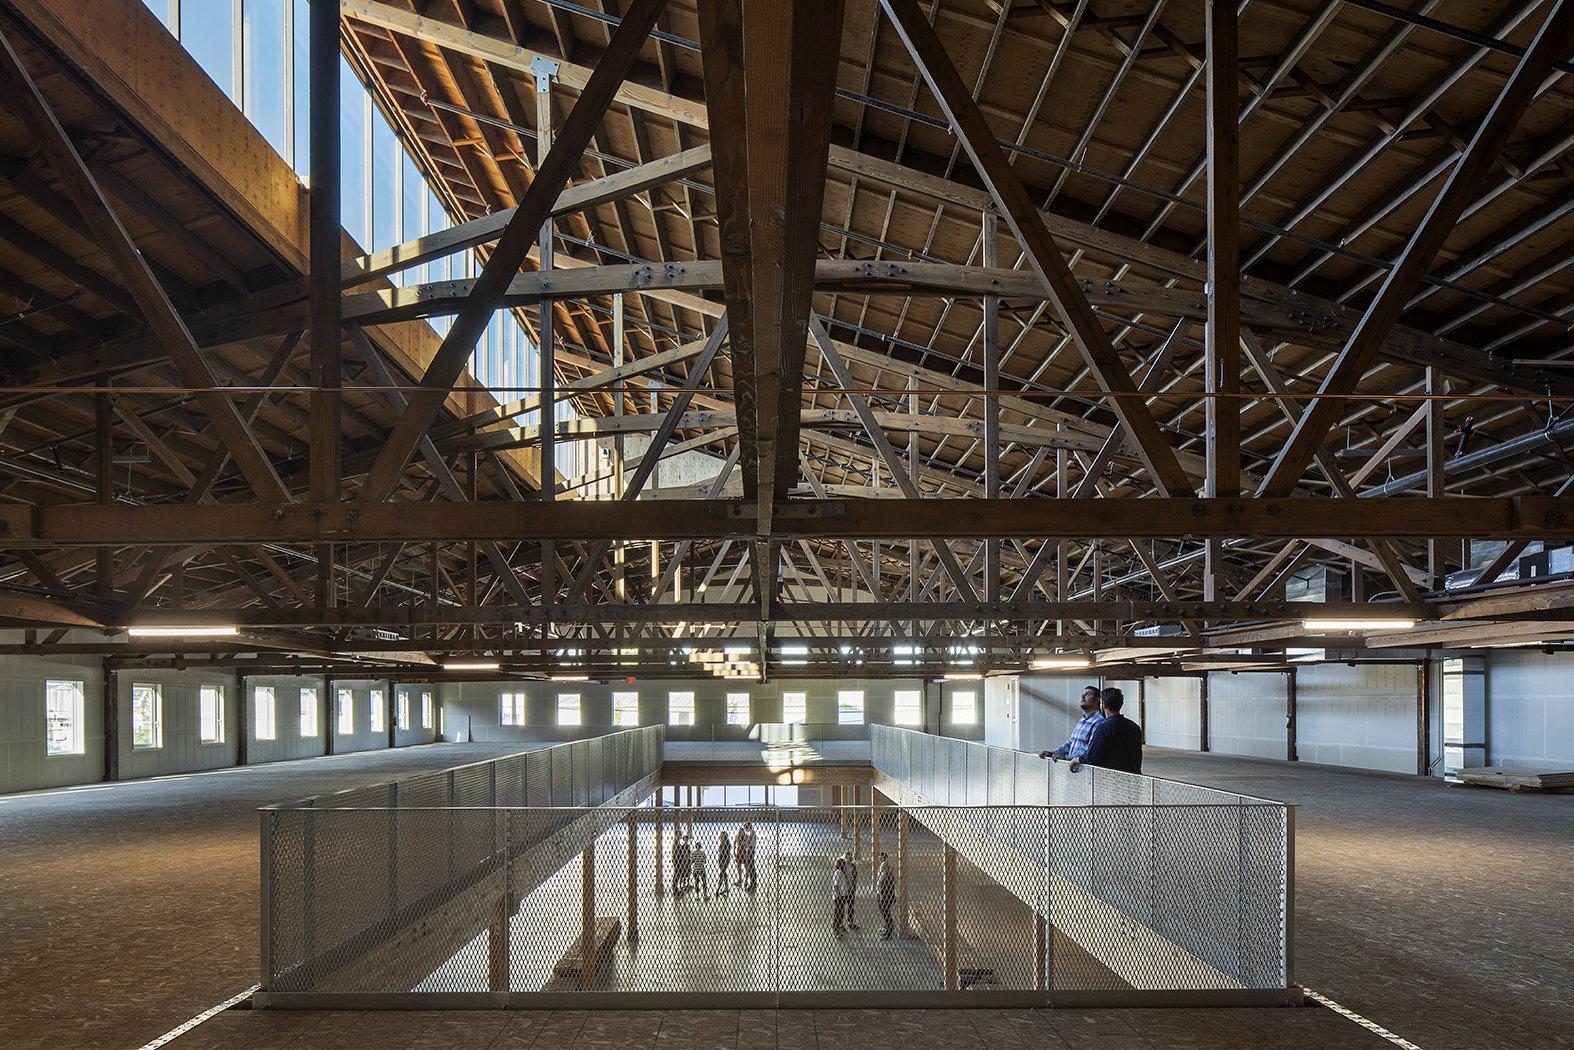 Reflete o passado industrial